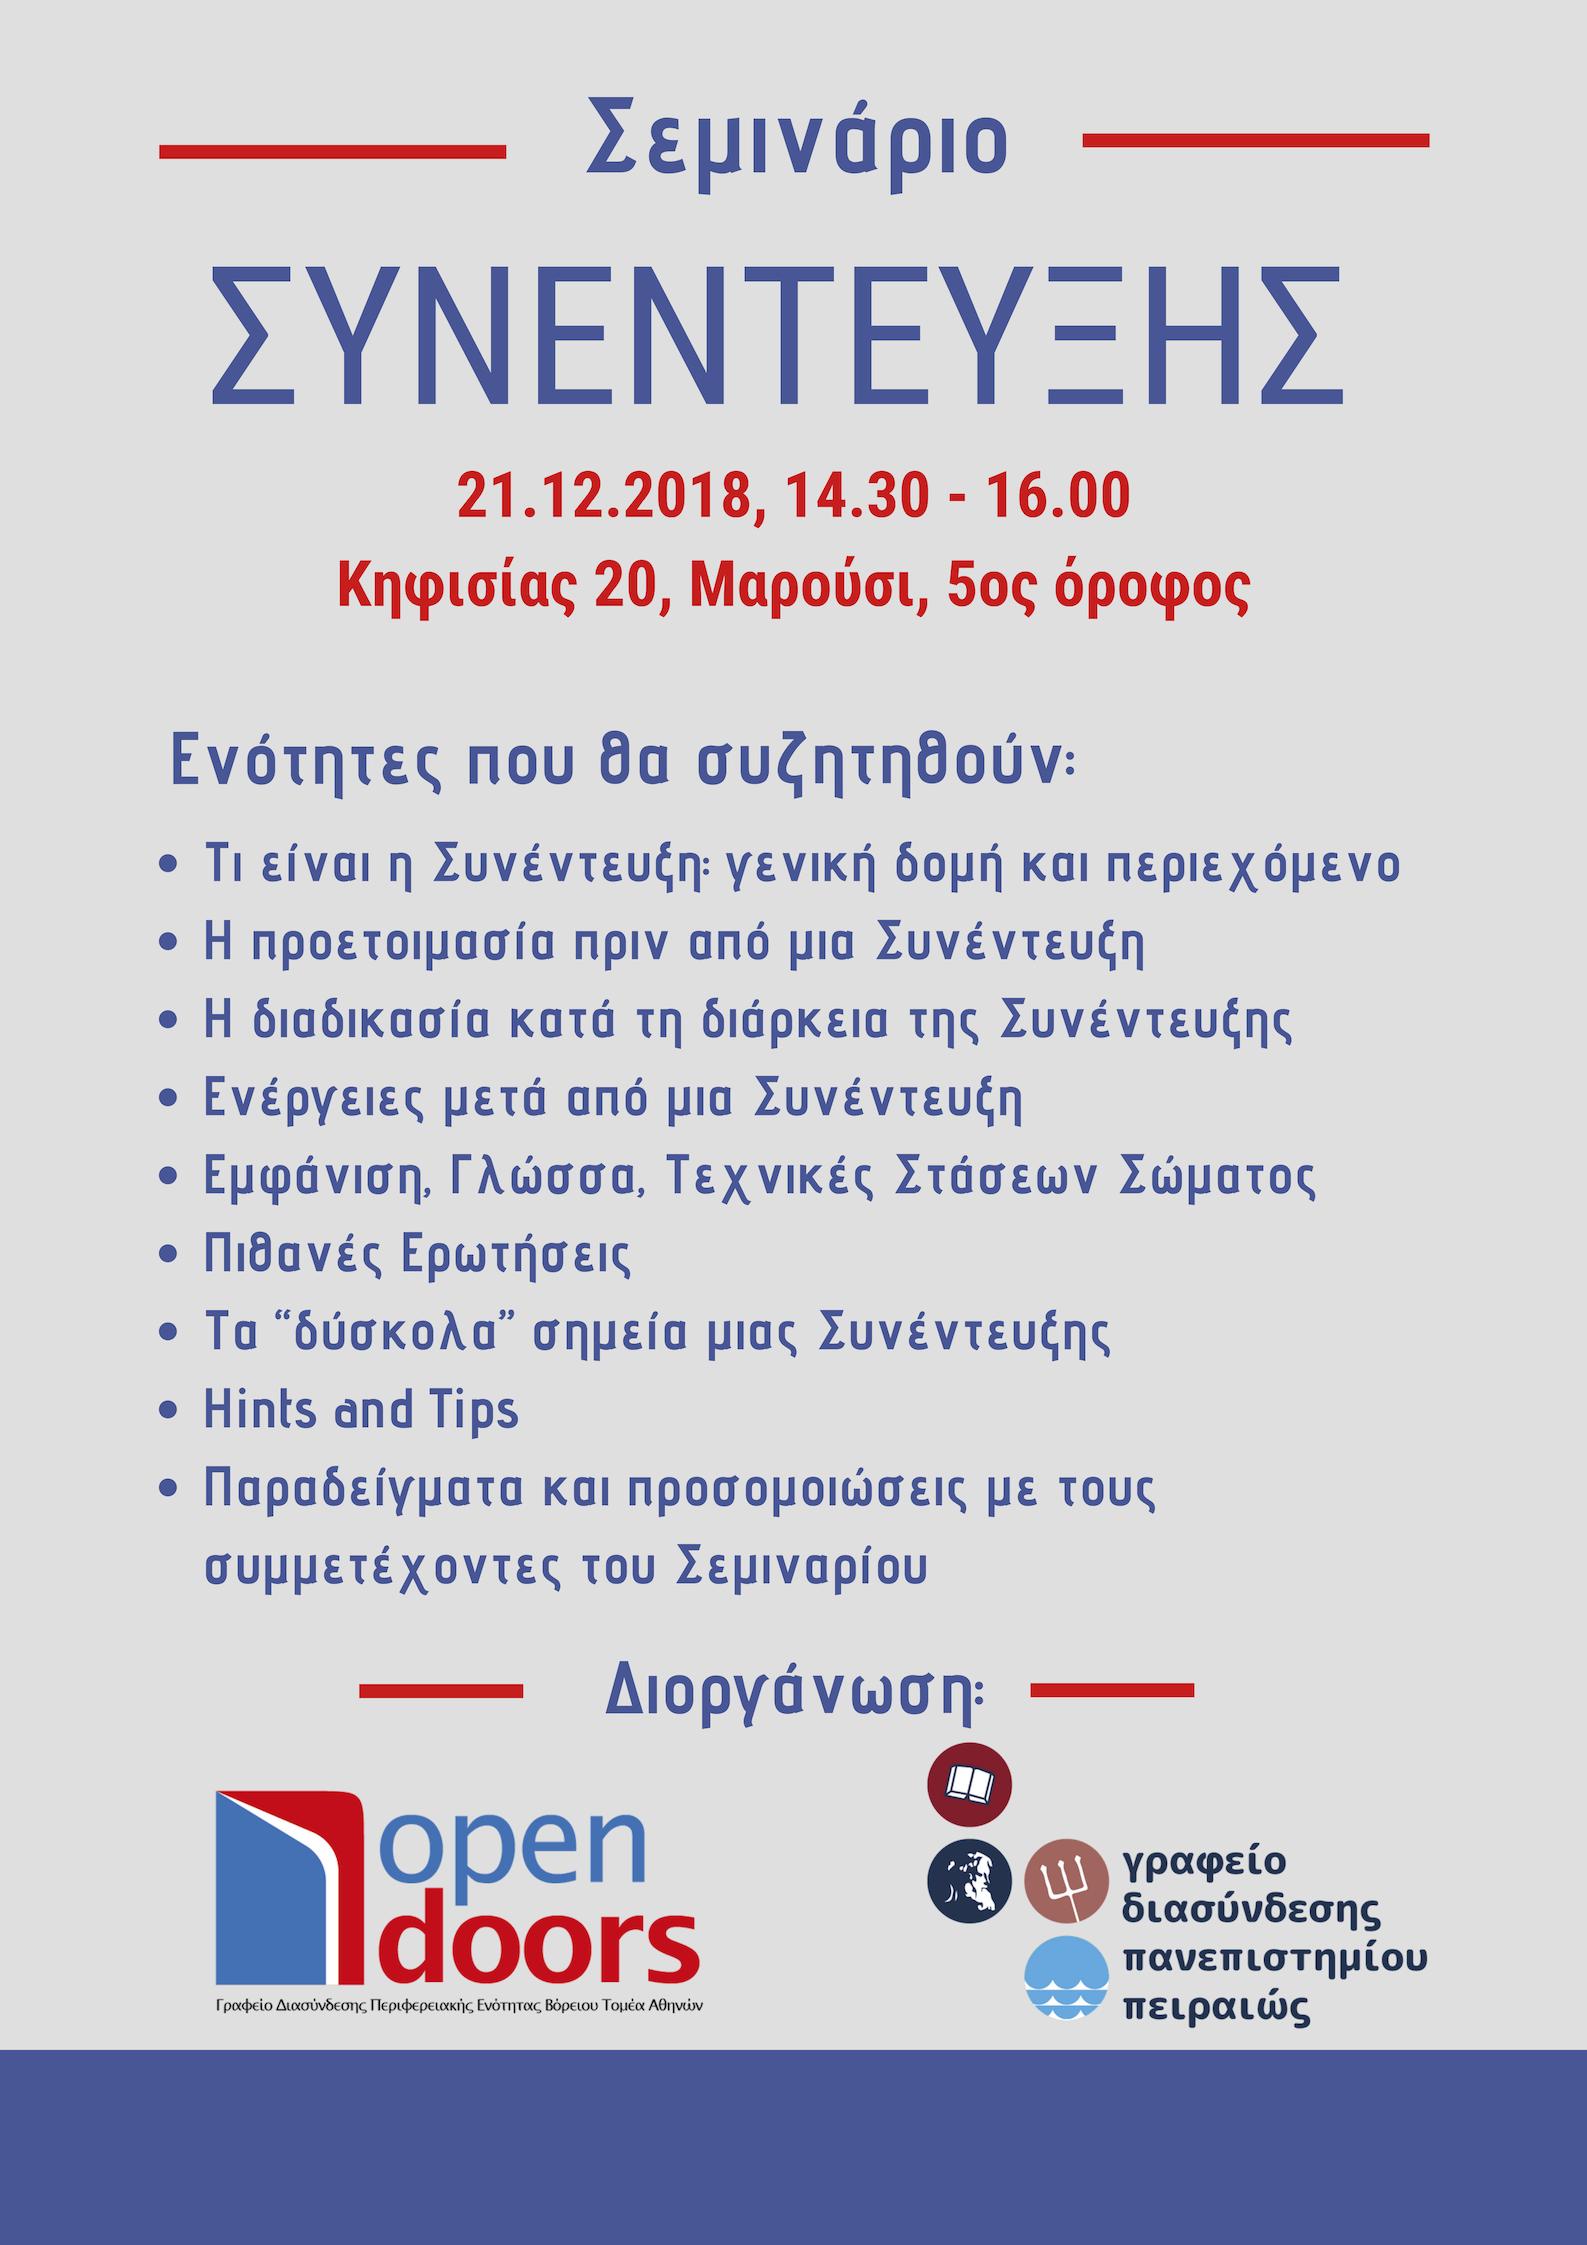 2o ΣΕΜΙΝΑΡΙΟ ΣΥΝΕΝΤΕΥΞΗΣ OPENDOORS